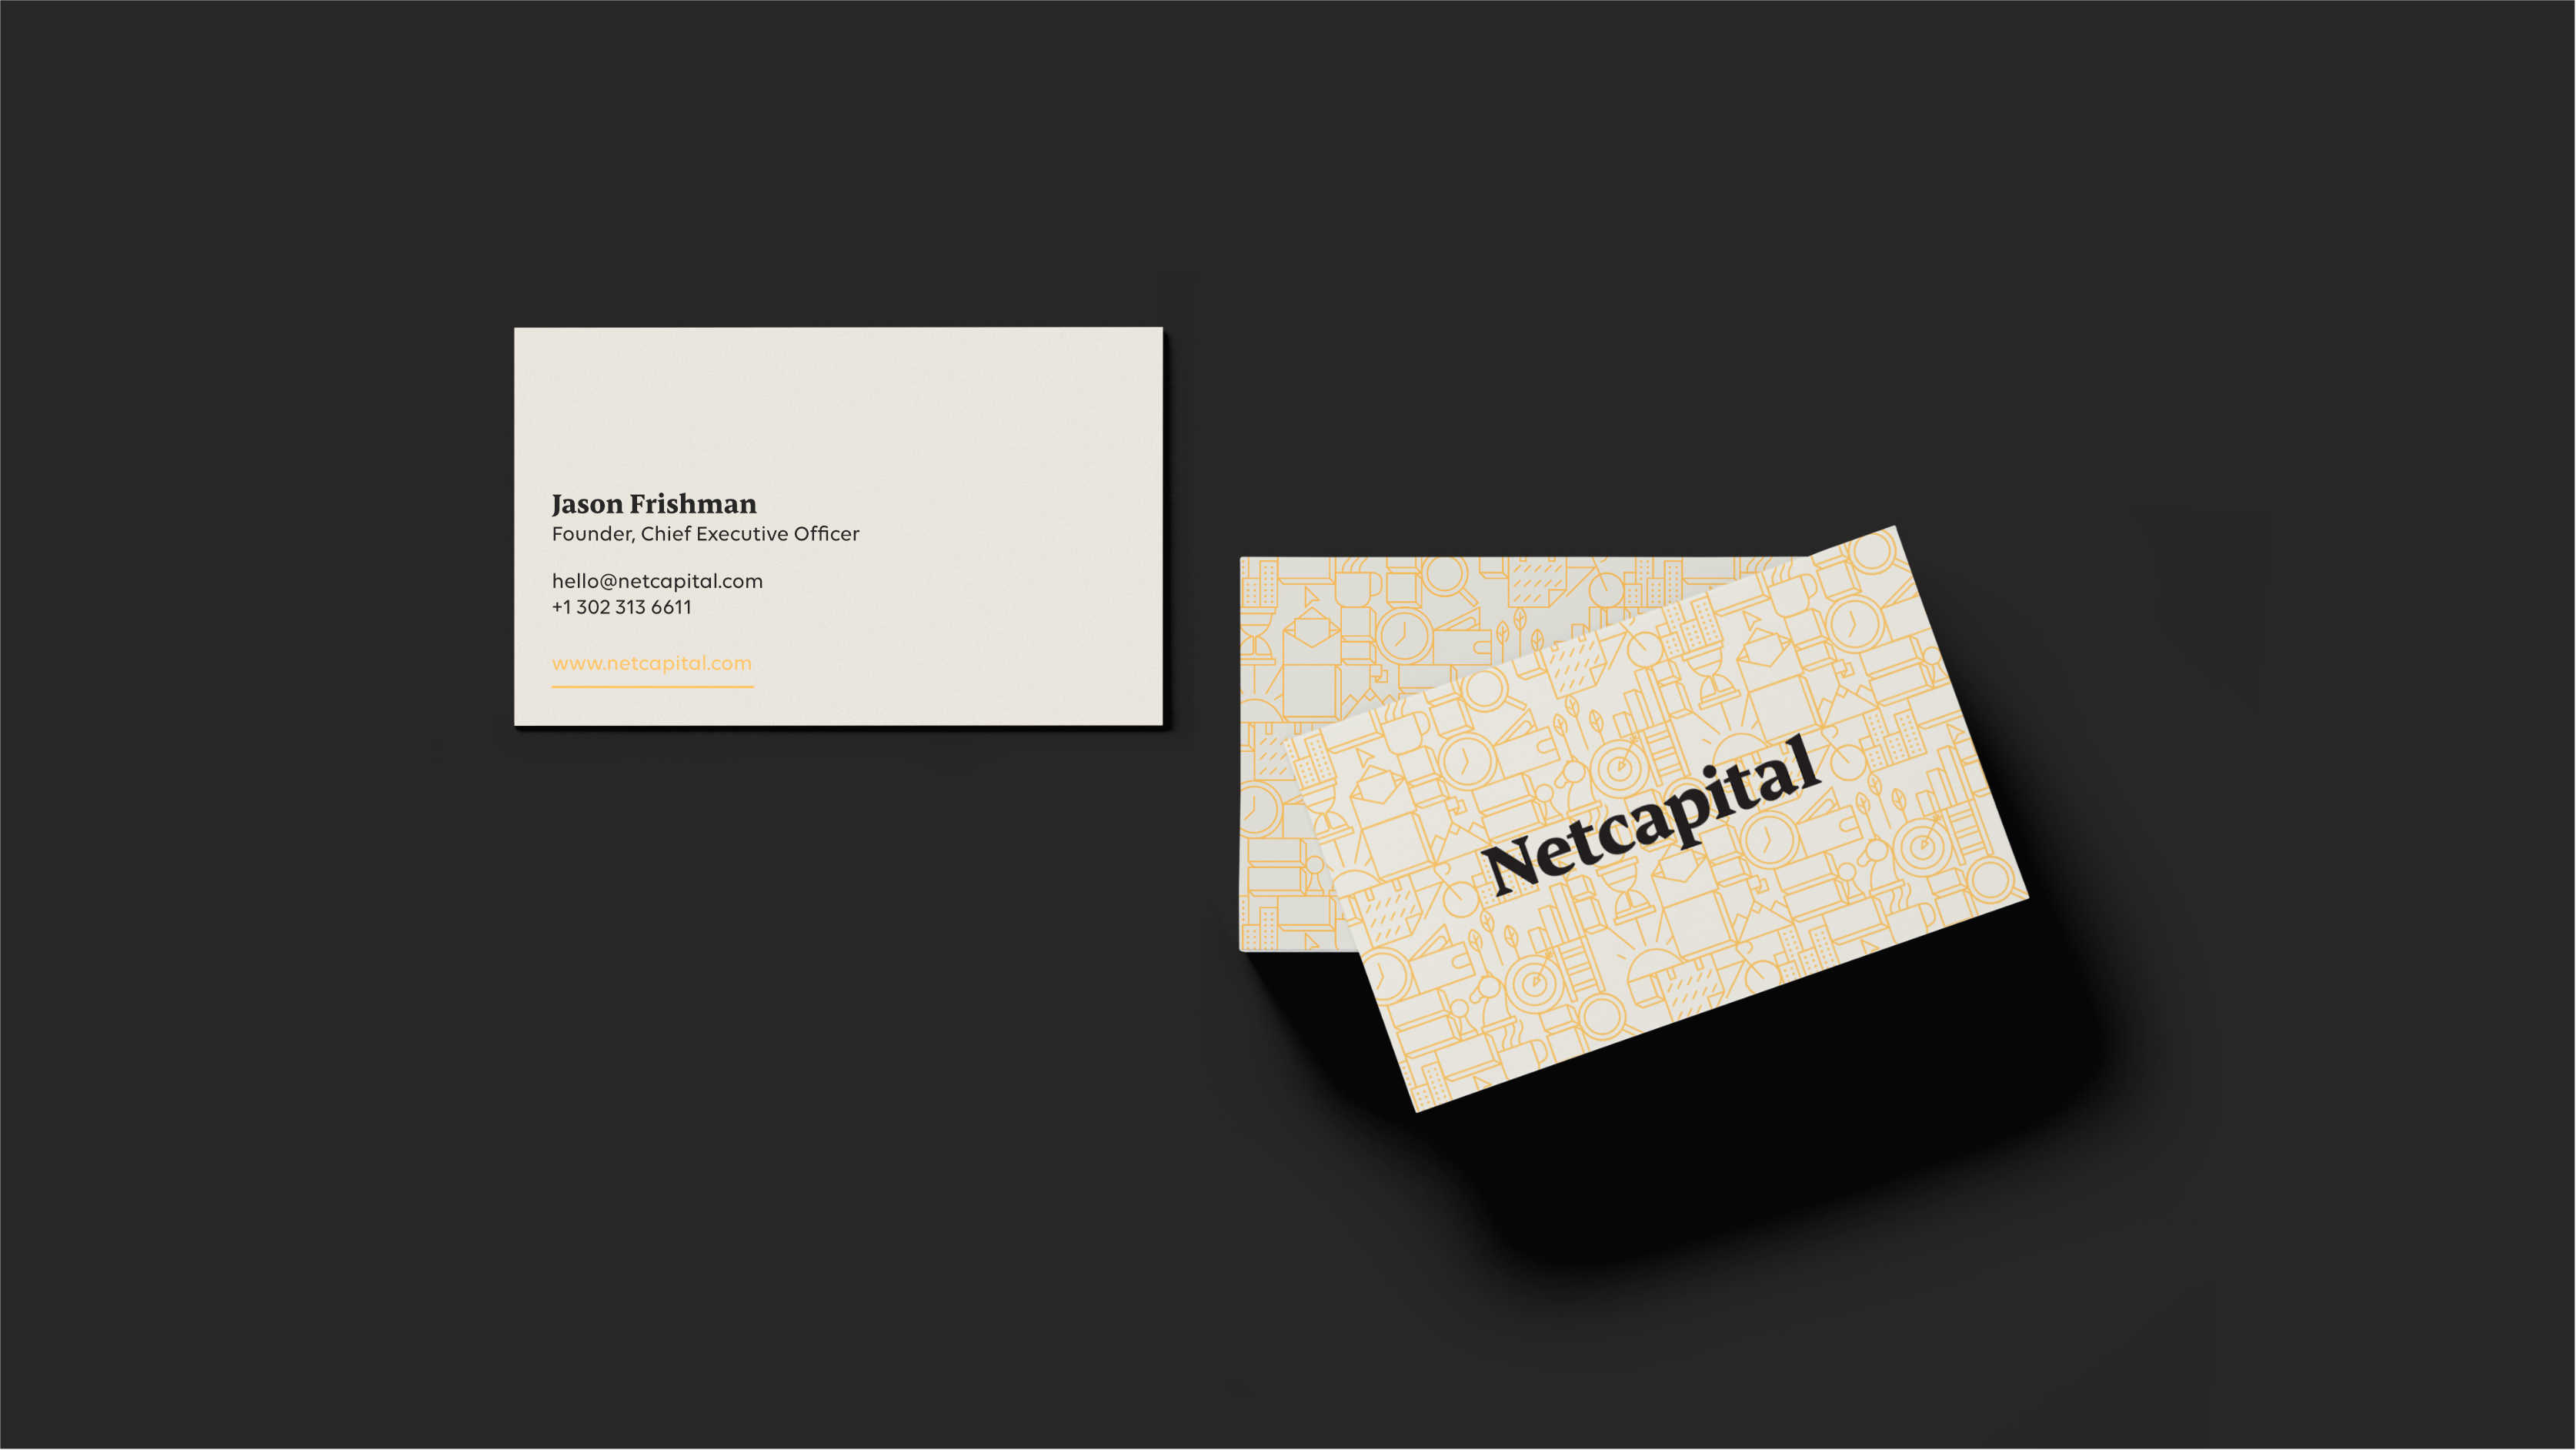 Netcapital Business Card Design